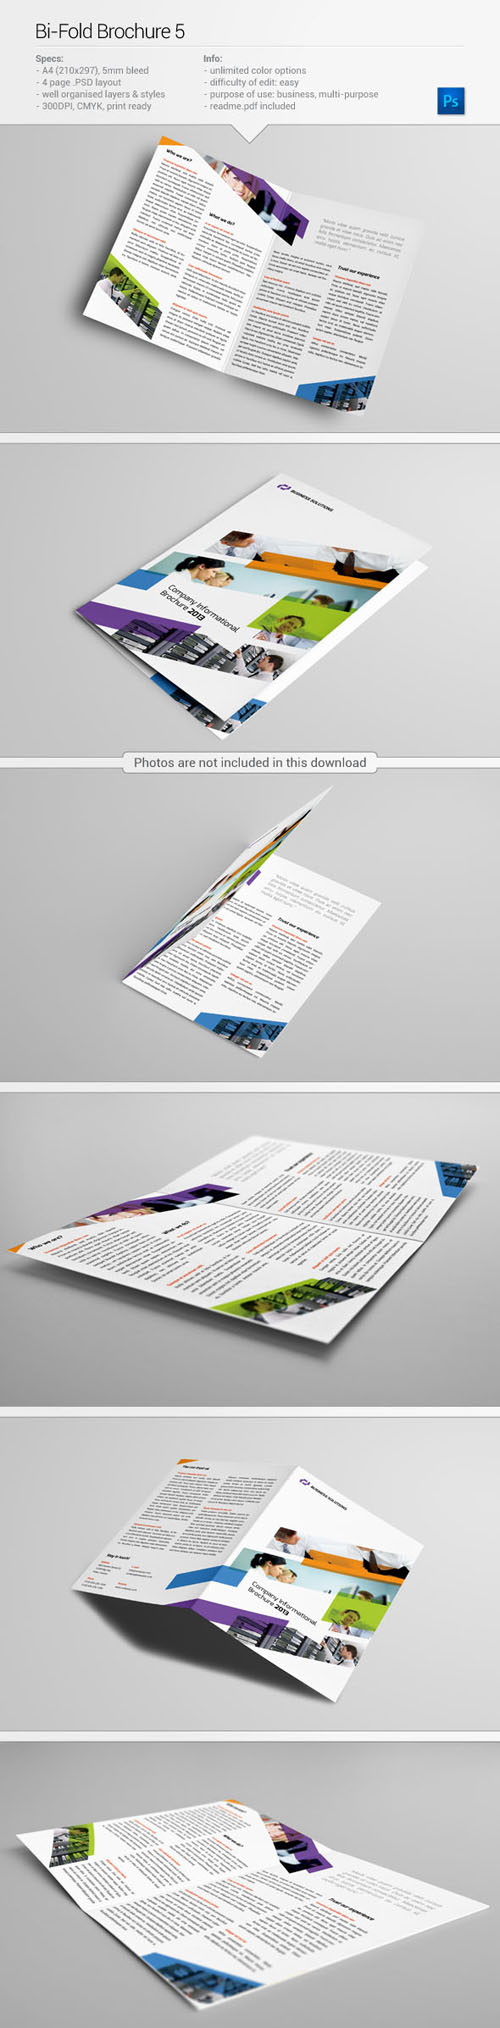 Bi-Fold Brochure Free PSD File